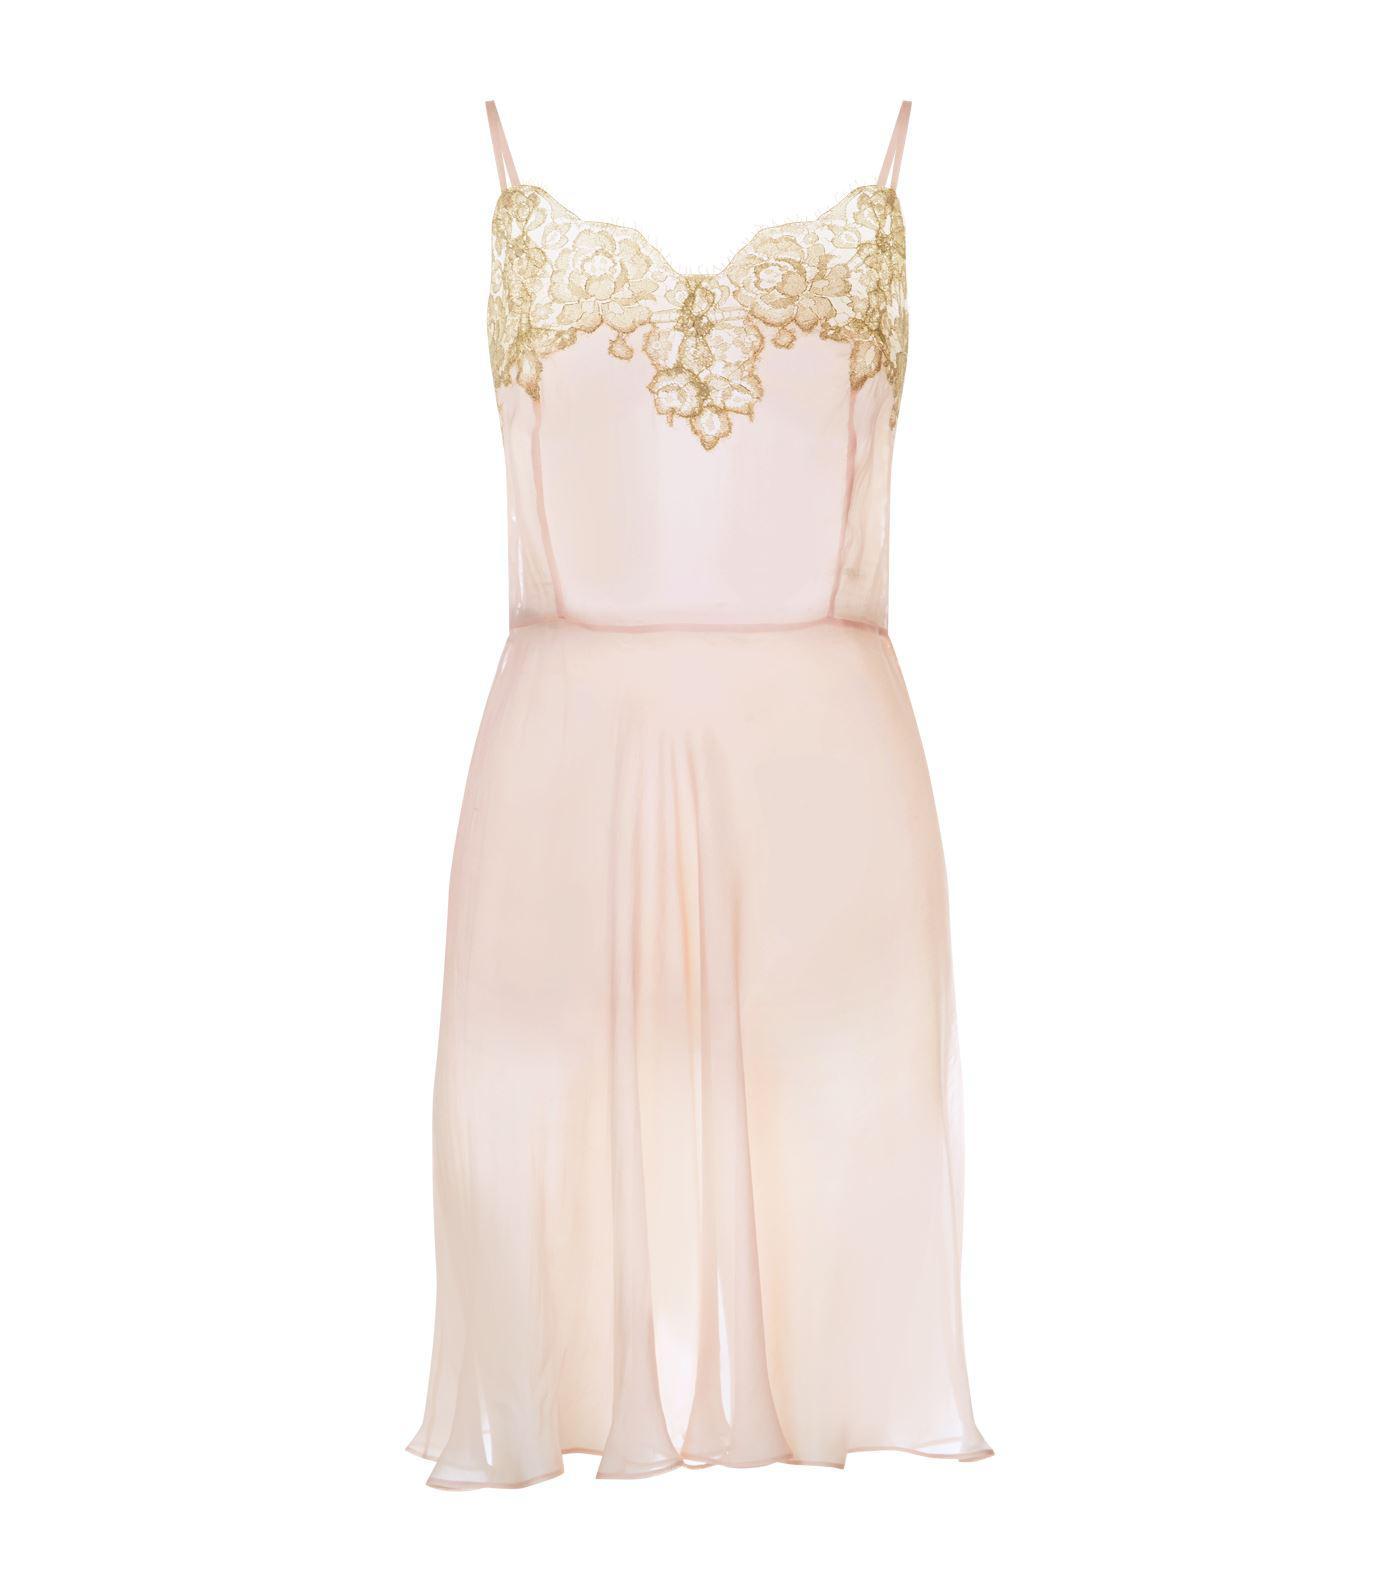 Rosamosario Silk Nightdress in Pink - Lyst 2794063f1